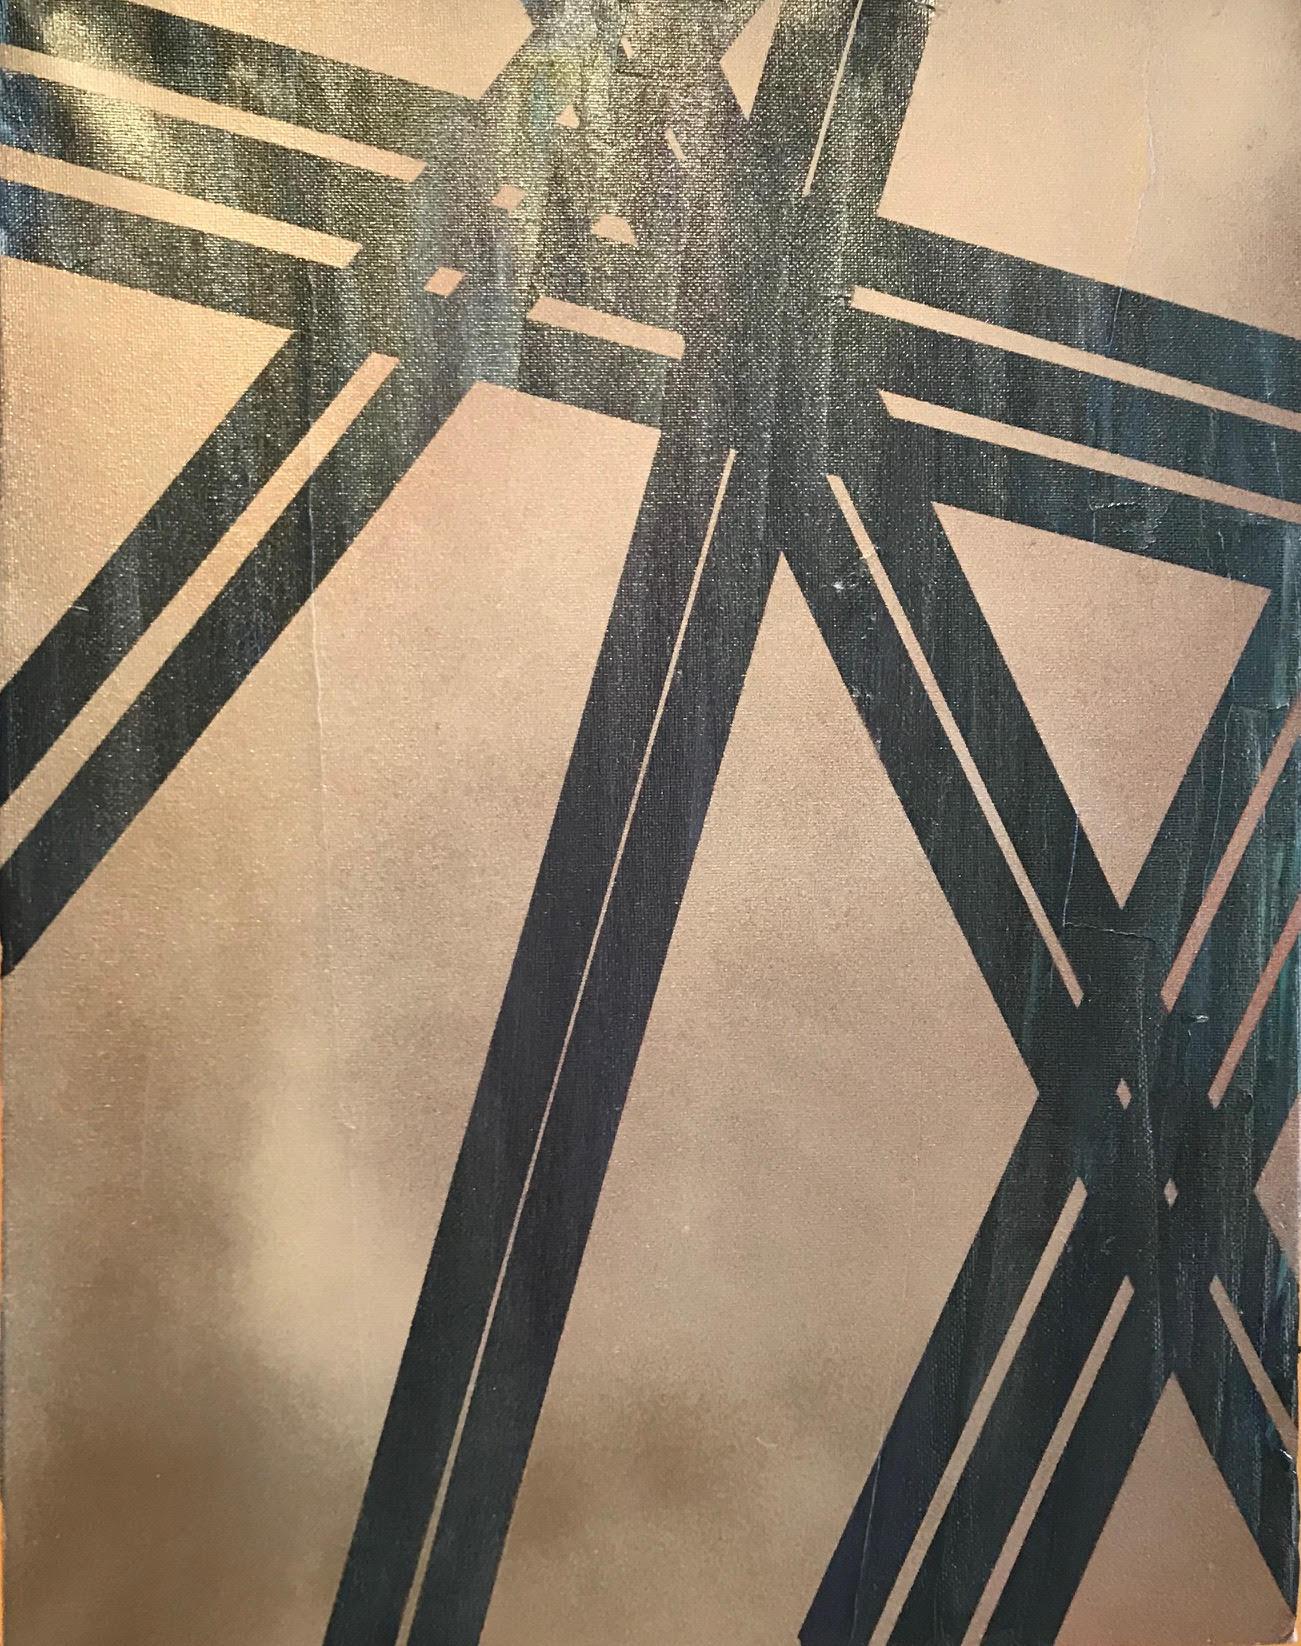 Cranes for Days No 5 - Spray Paint/Acrylic